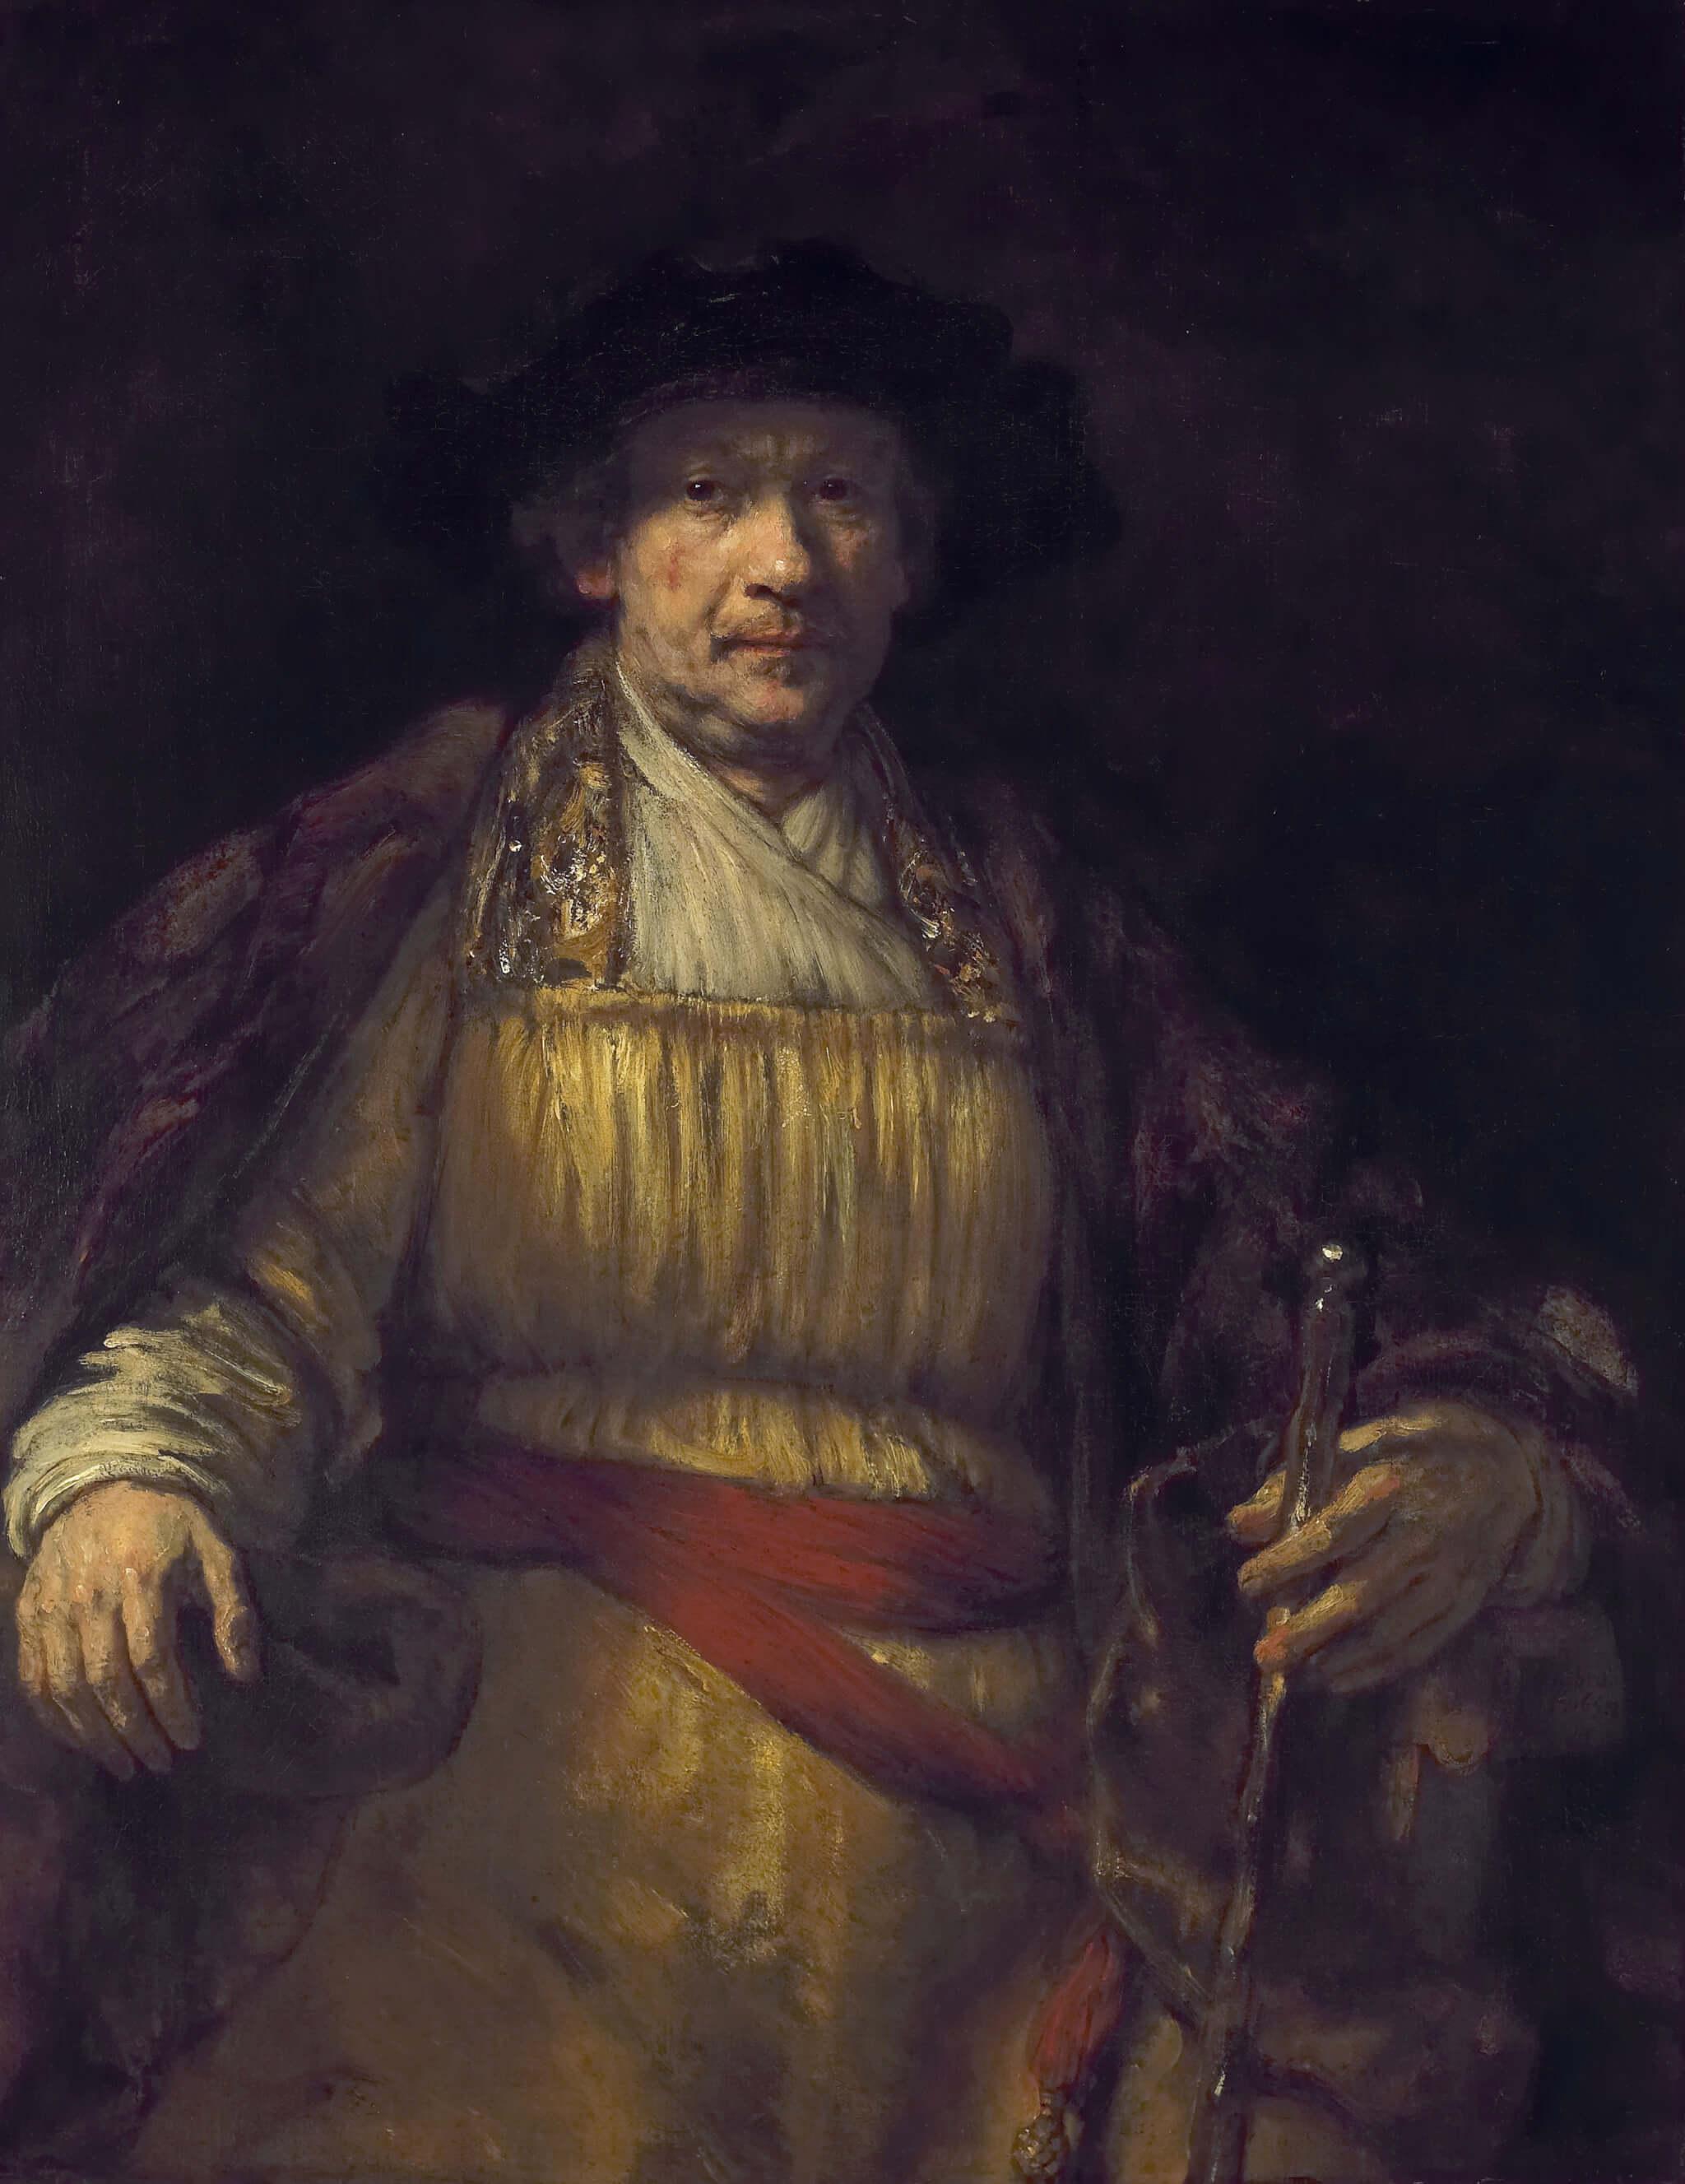 Atorretraato del pinto holandés Rembrant